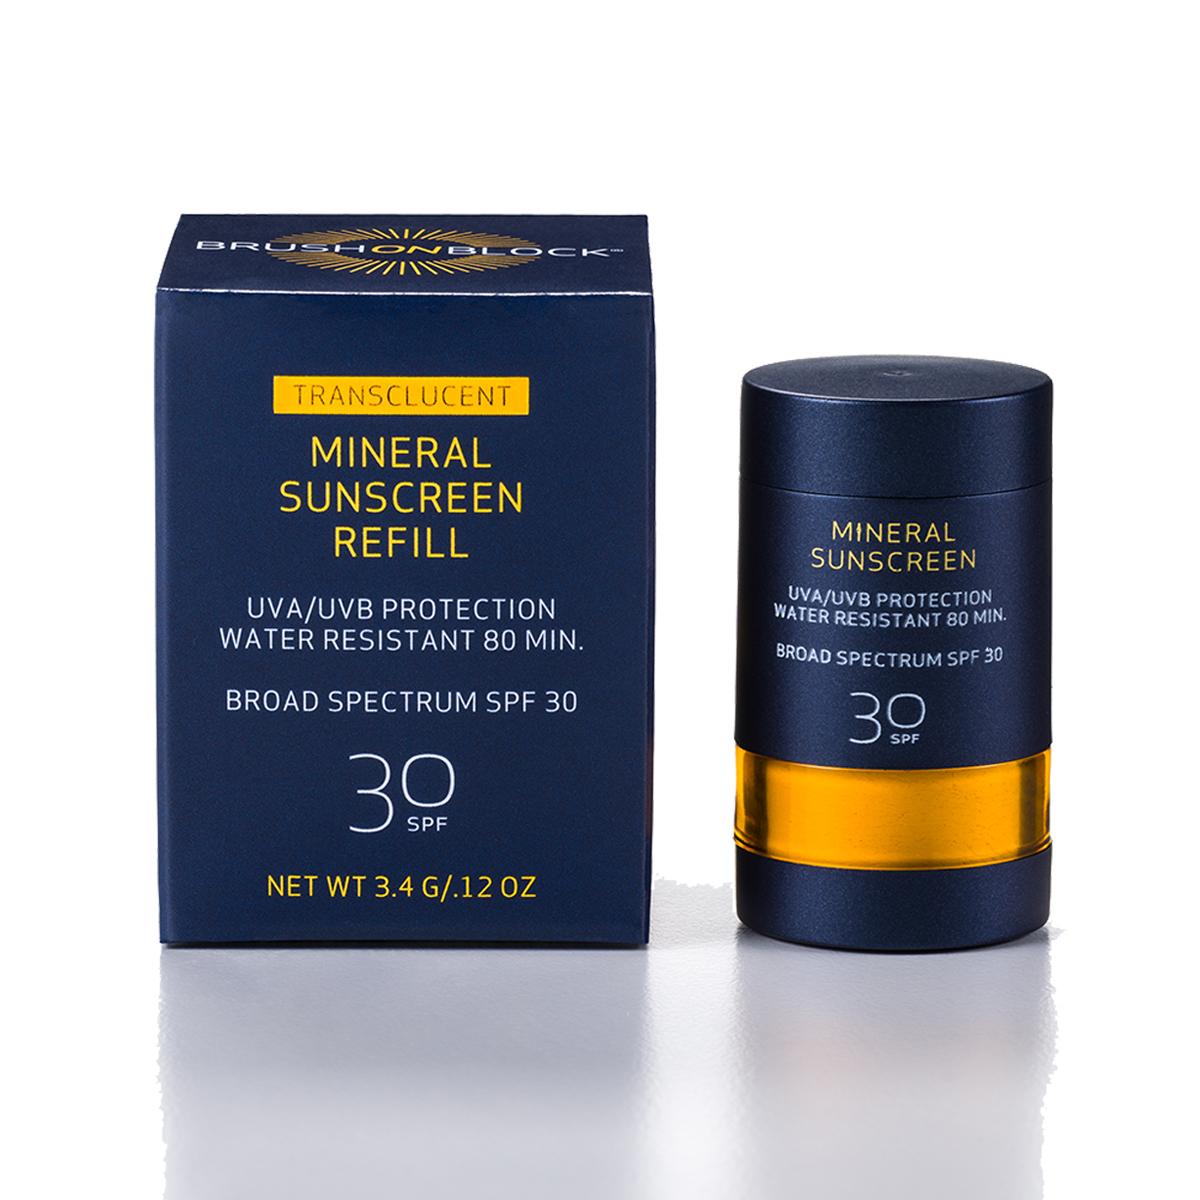 https://benessere.gr/wp-content/uploads/2021/04/broad-spectrum-SPF30-mineral-powder-refill.jpg